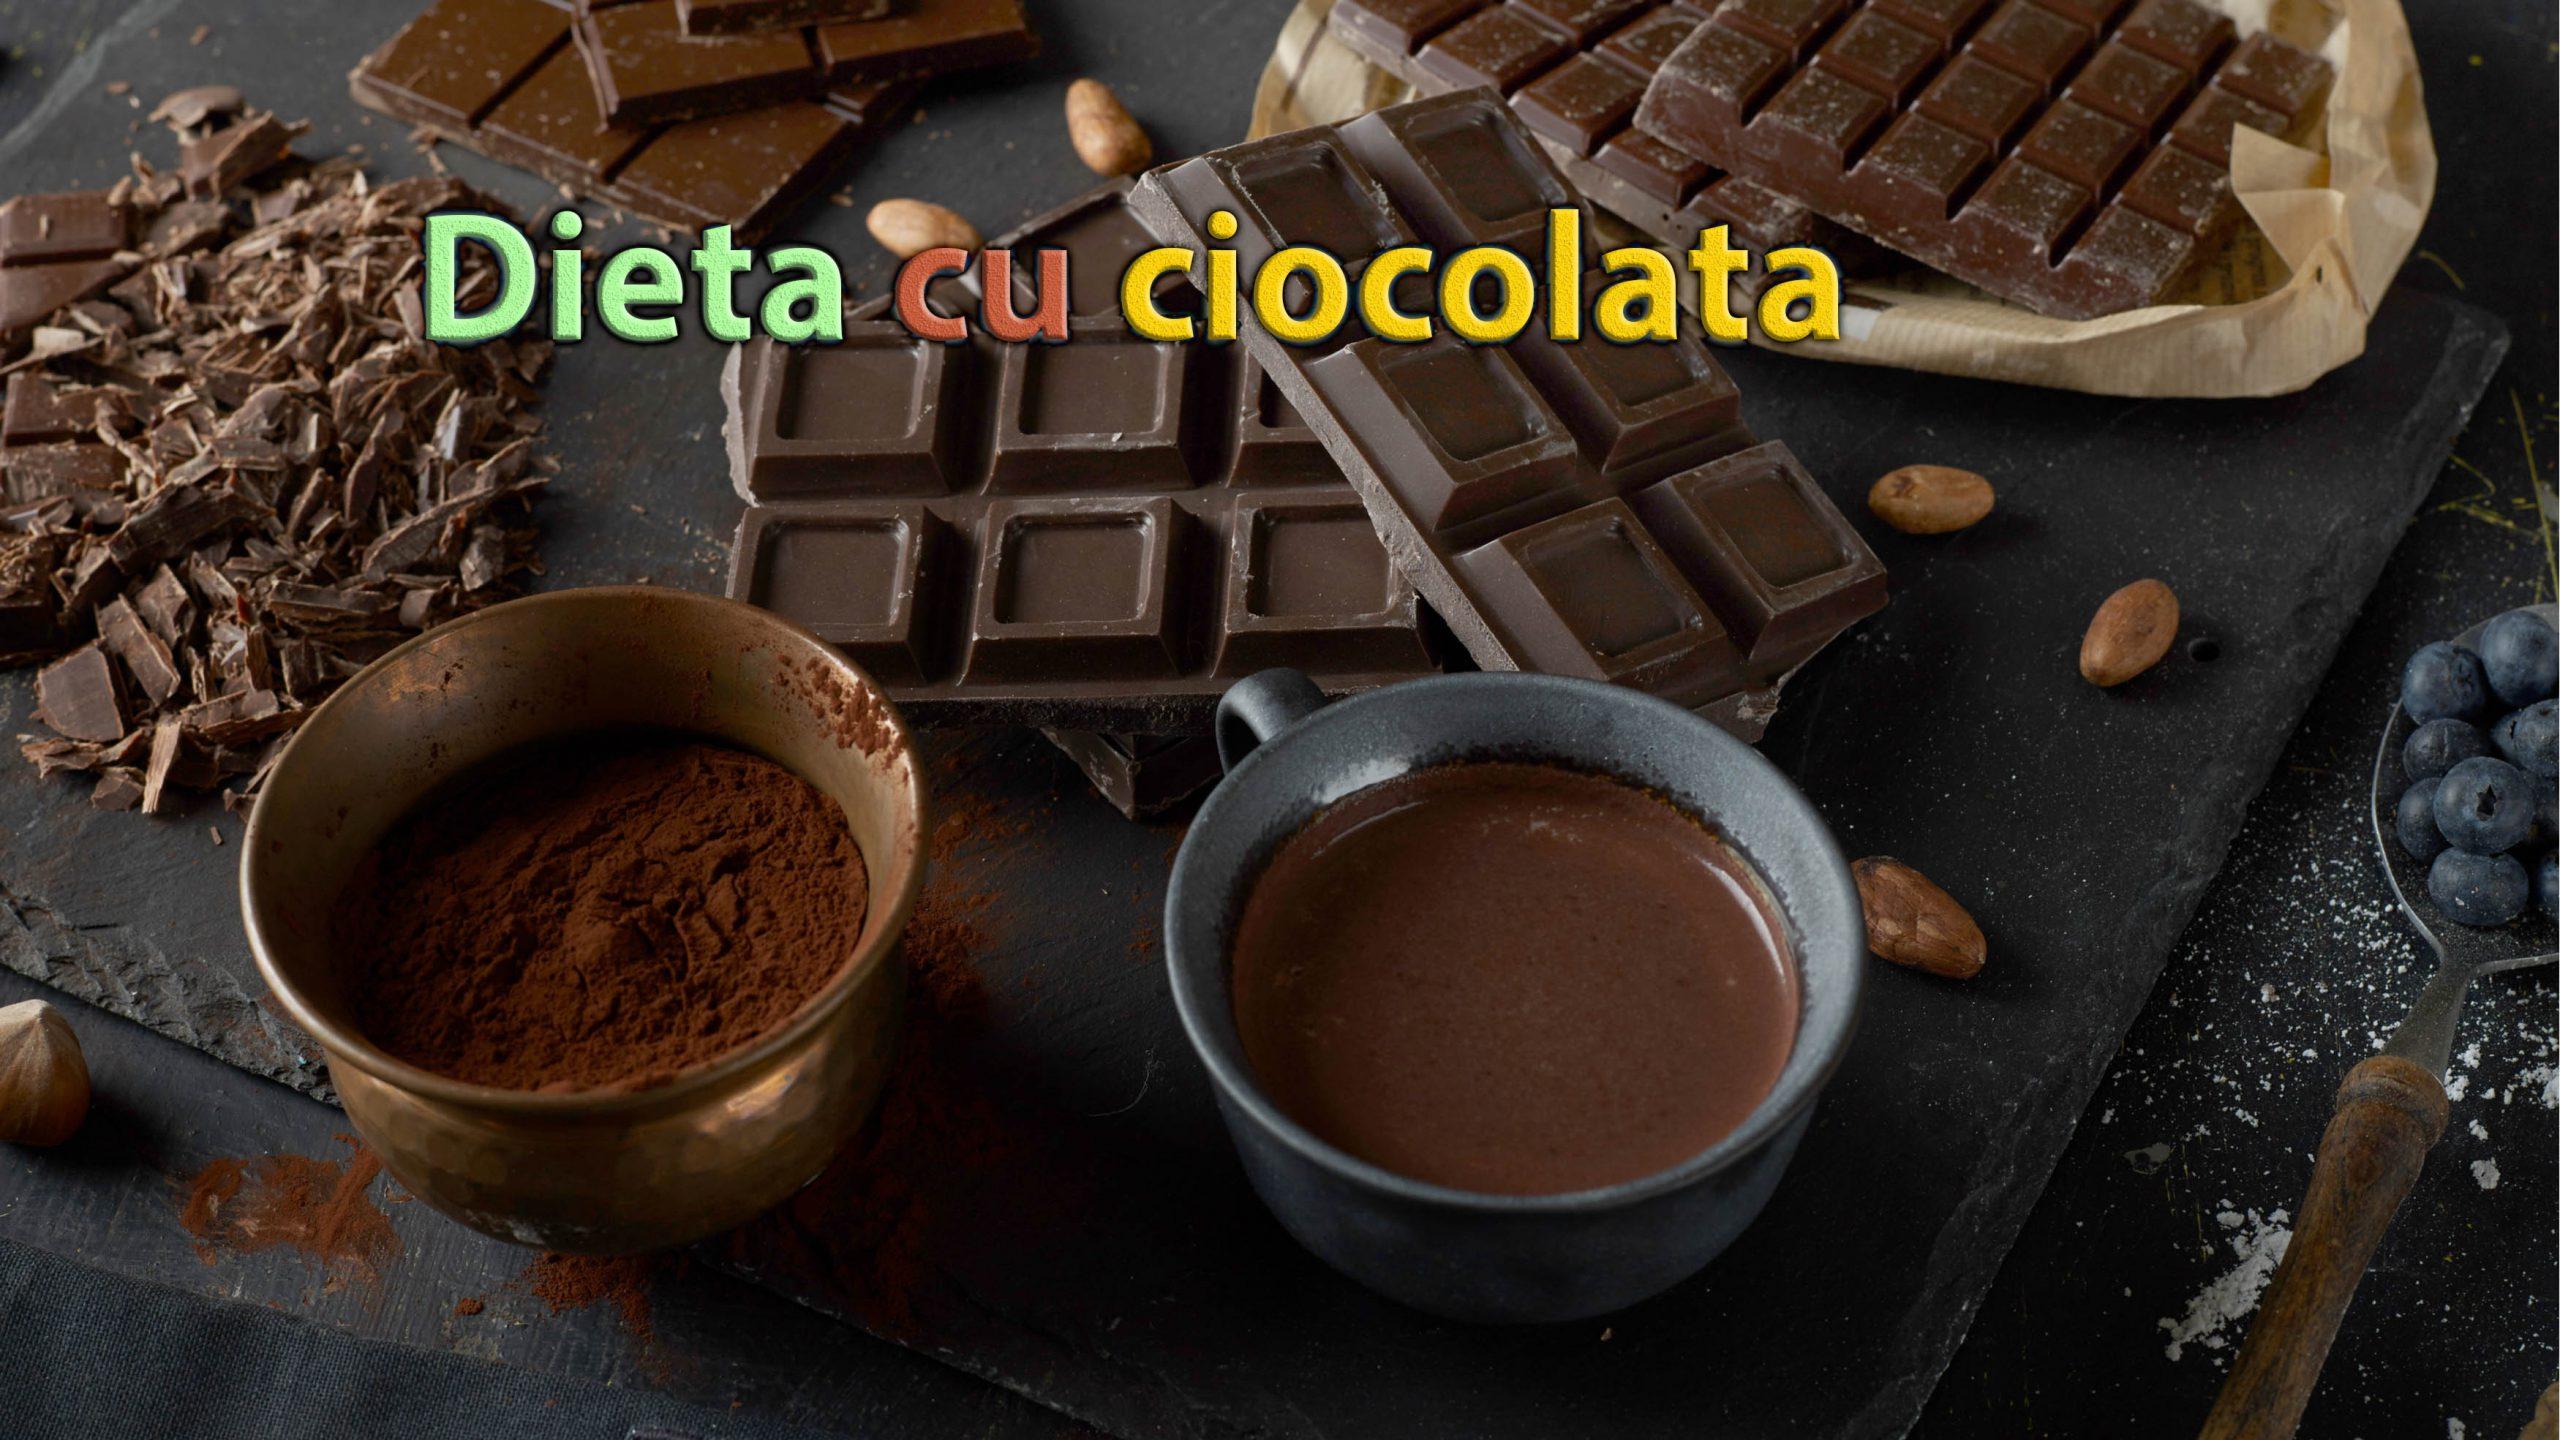 dieta cu ciocolata